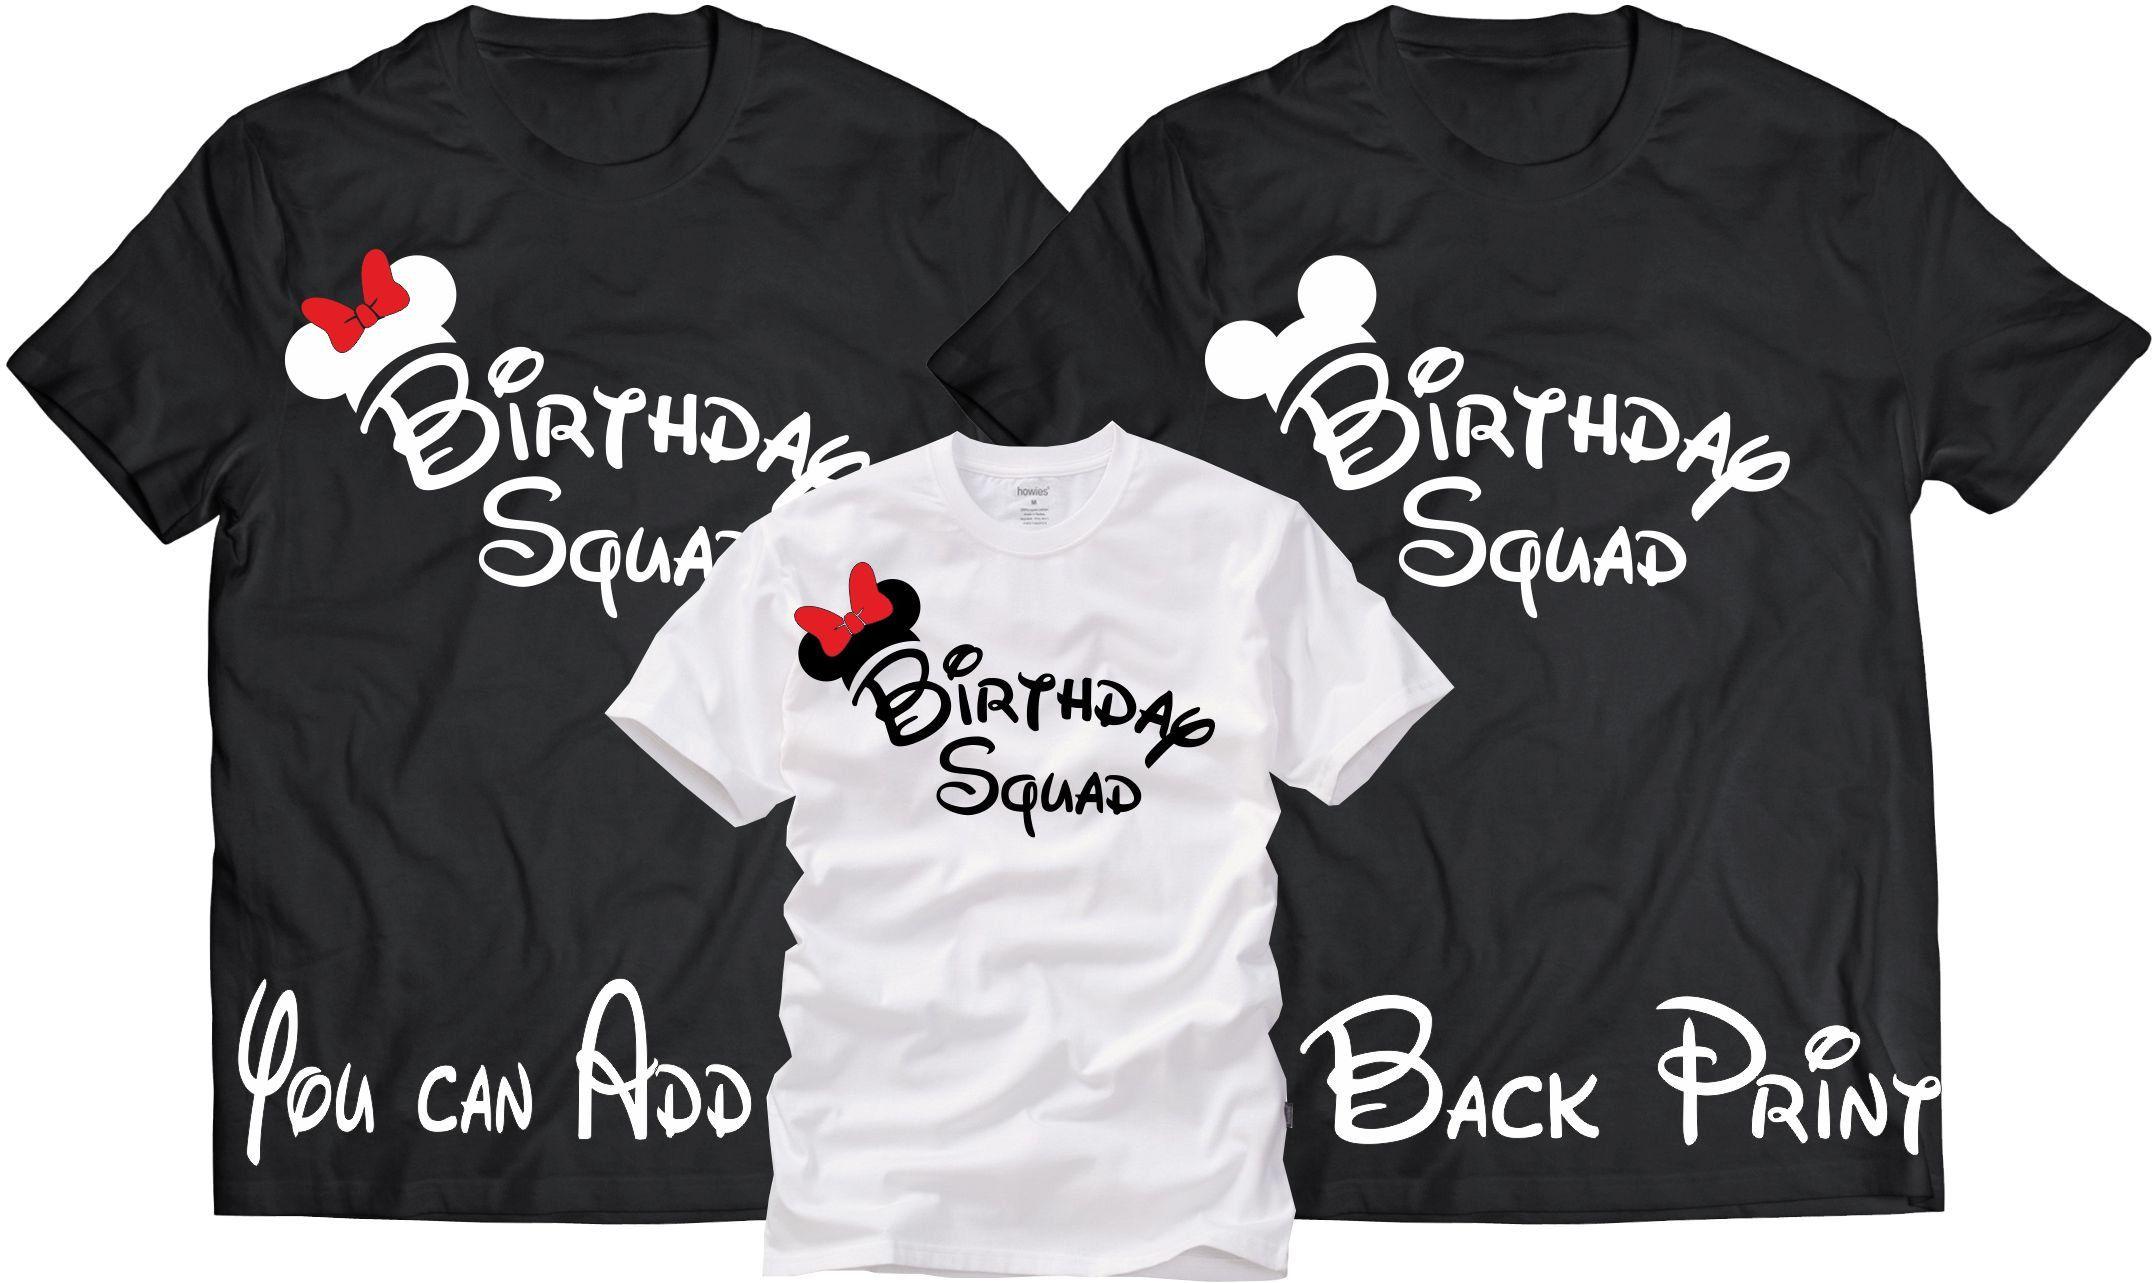 The Birthday Squad tees,Birthday shirt,Birthday Squad